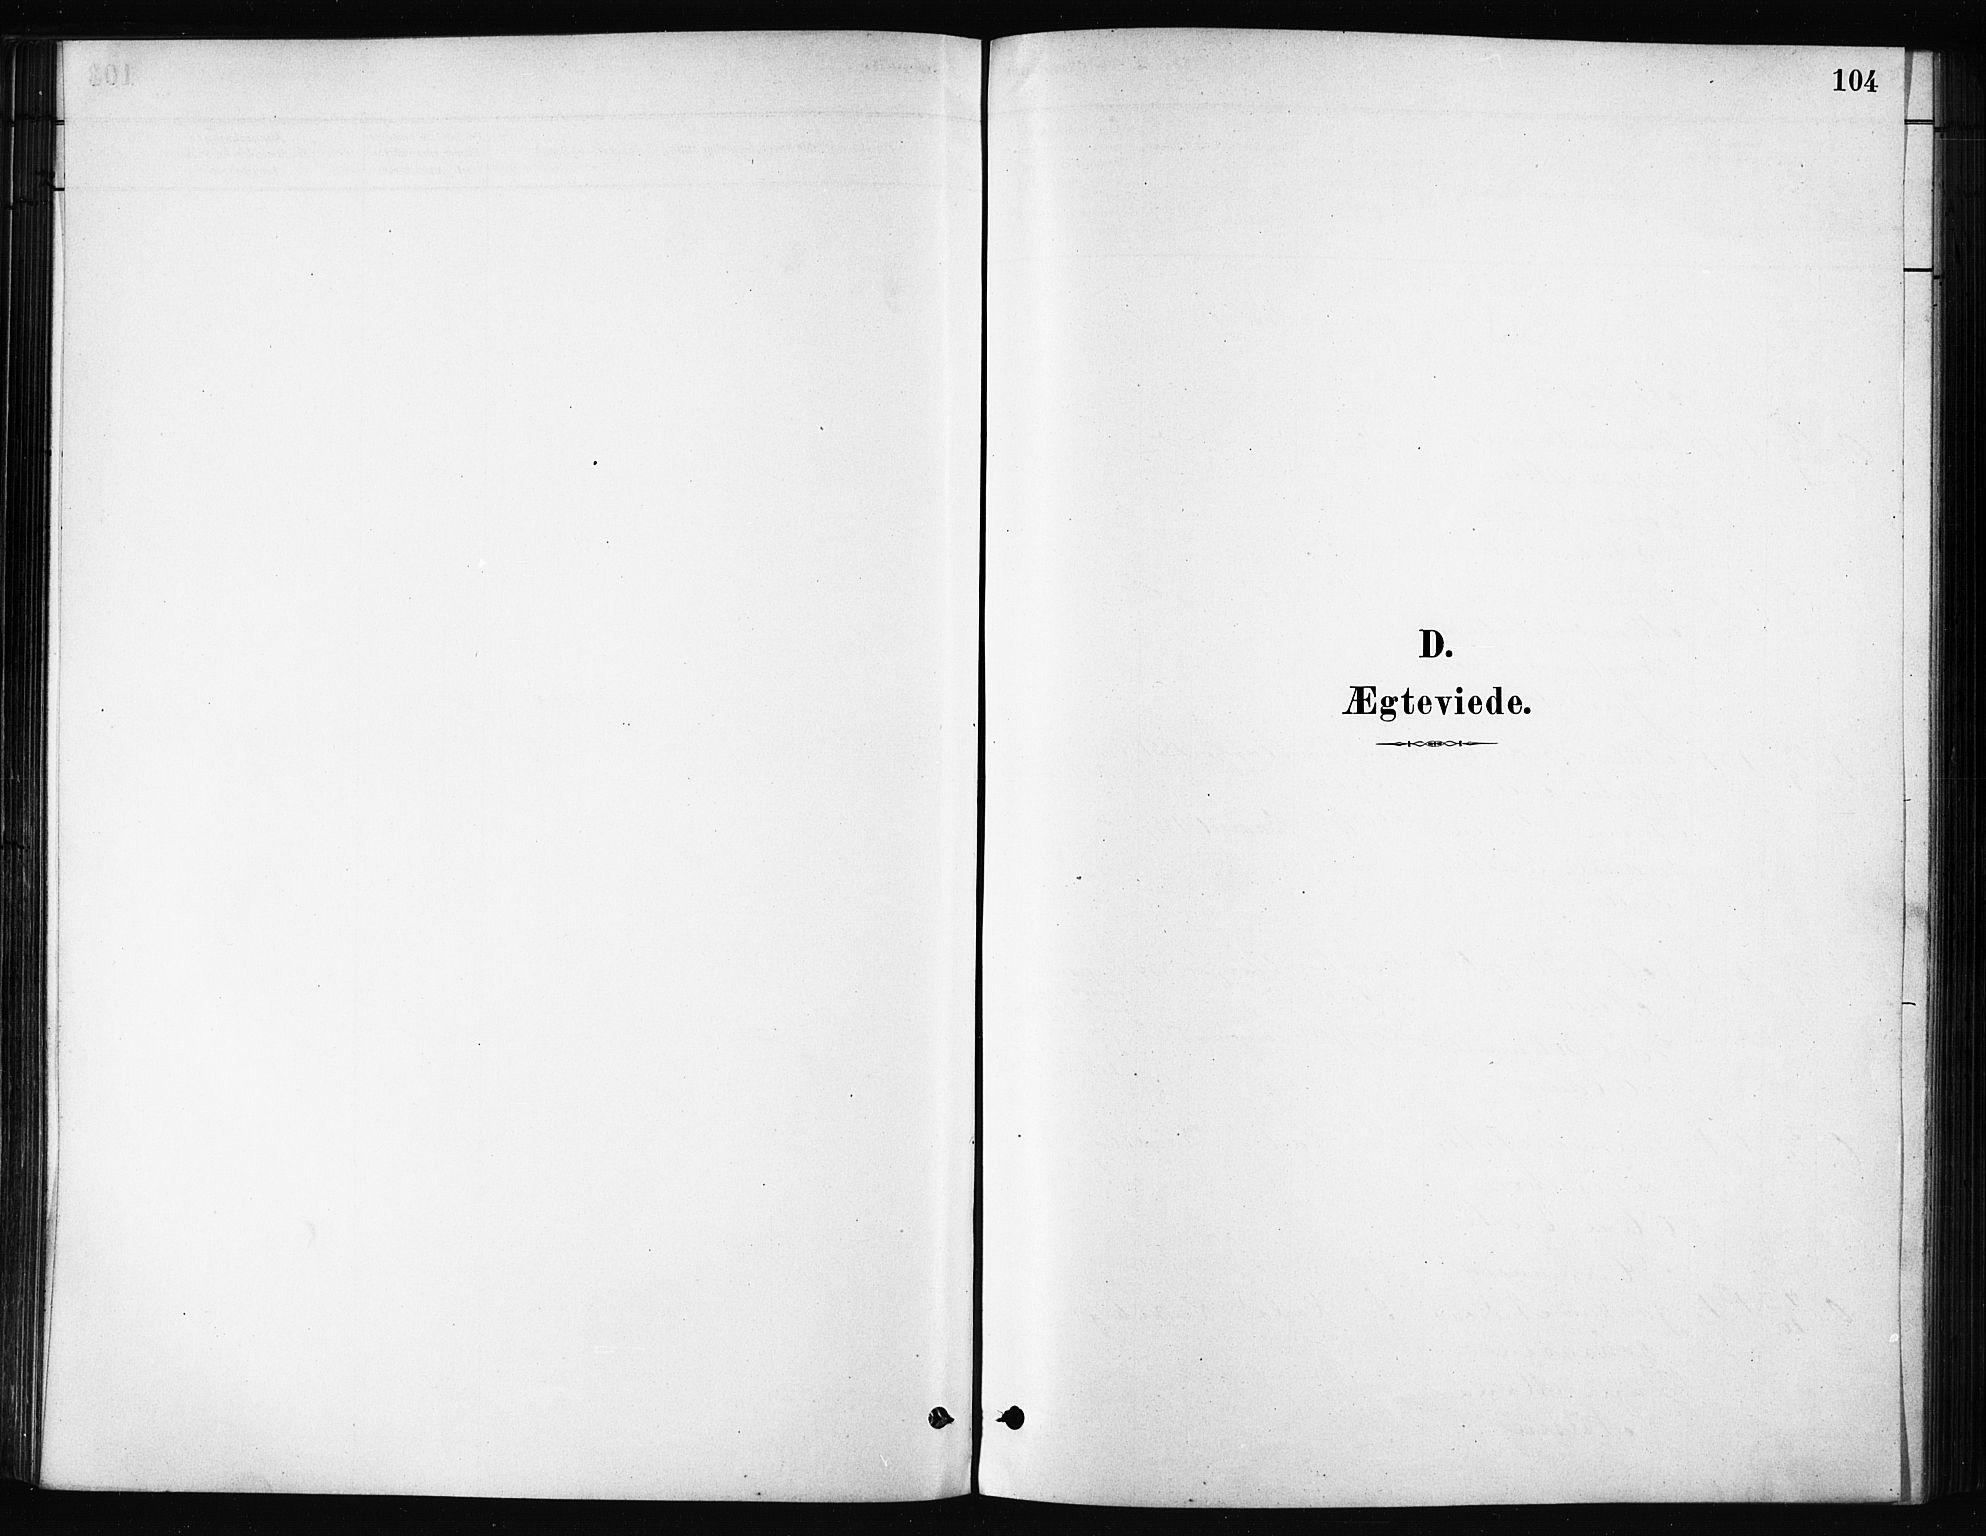 SATØ, Karlsøy sokneprestembete, H/Ha/Haa/L0011kirke: Ministerialbok nr. 11, 1879-1892, s. 104